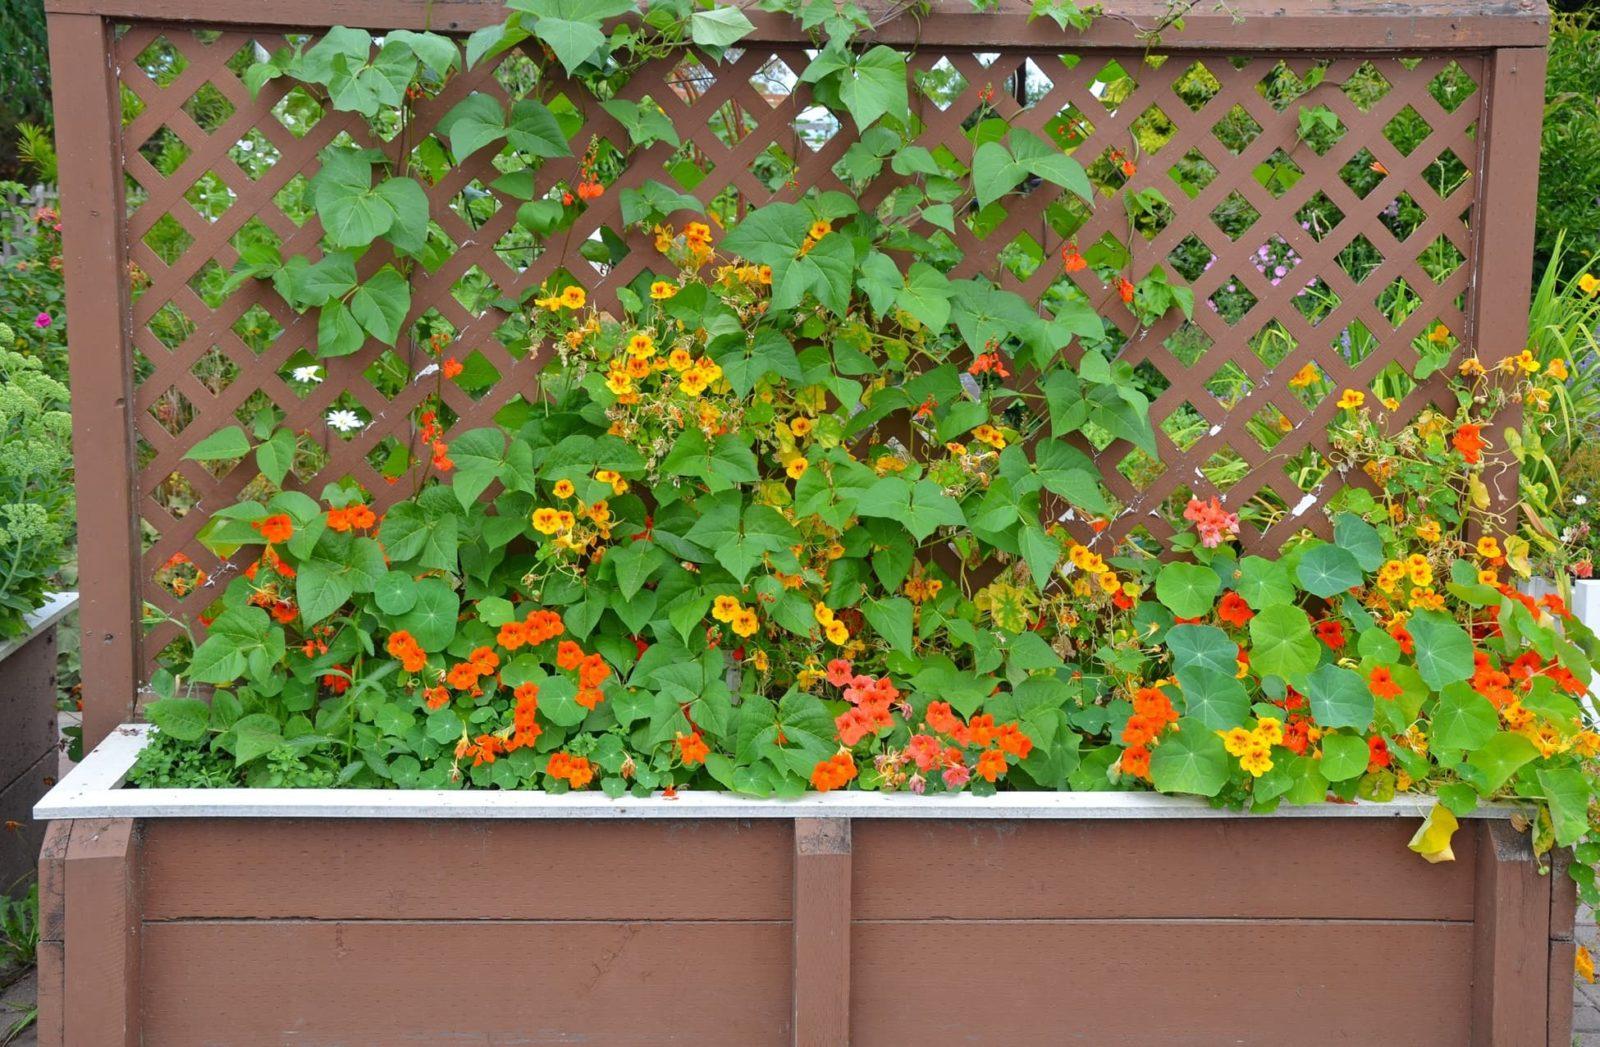 wooden trellis planter with yellow and orange plants